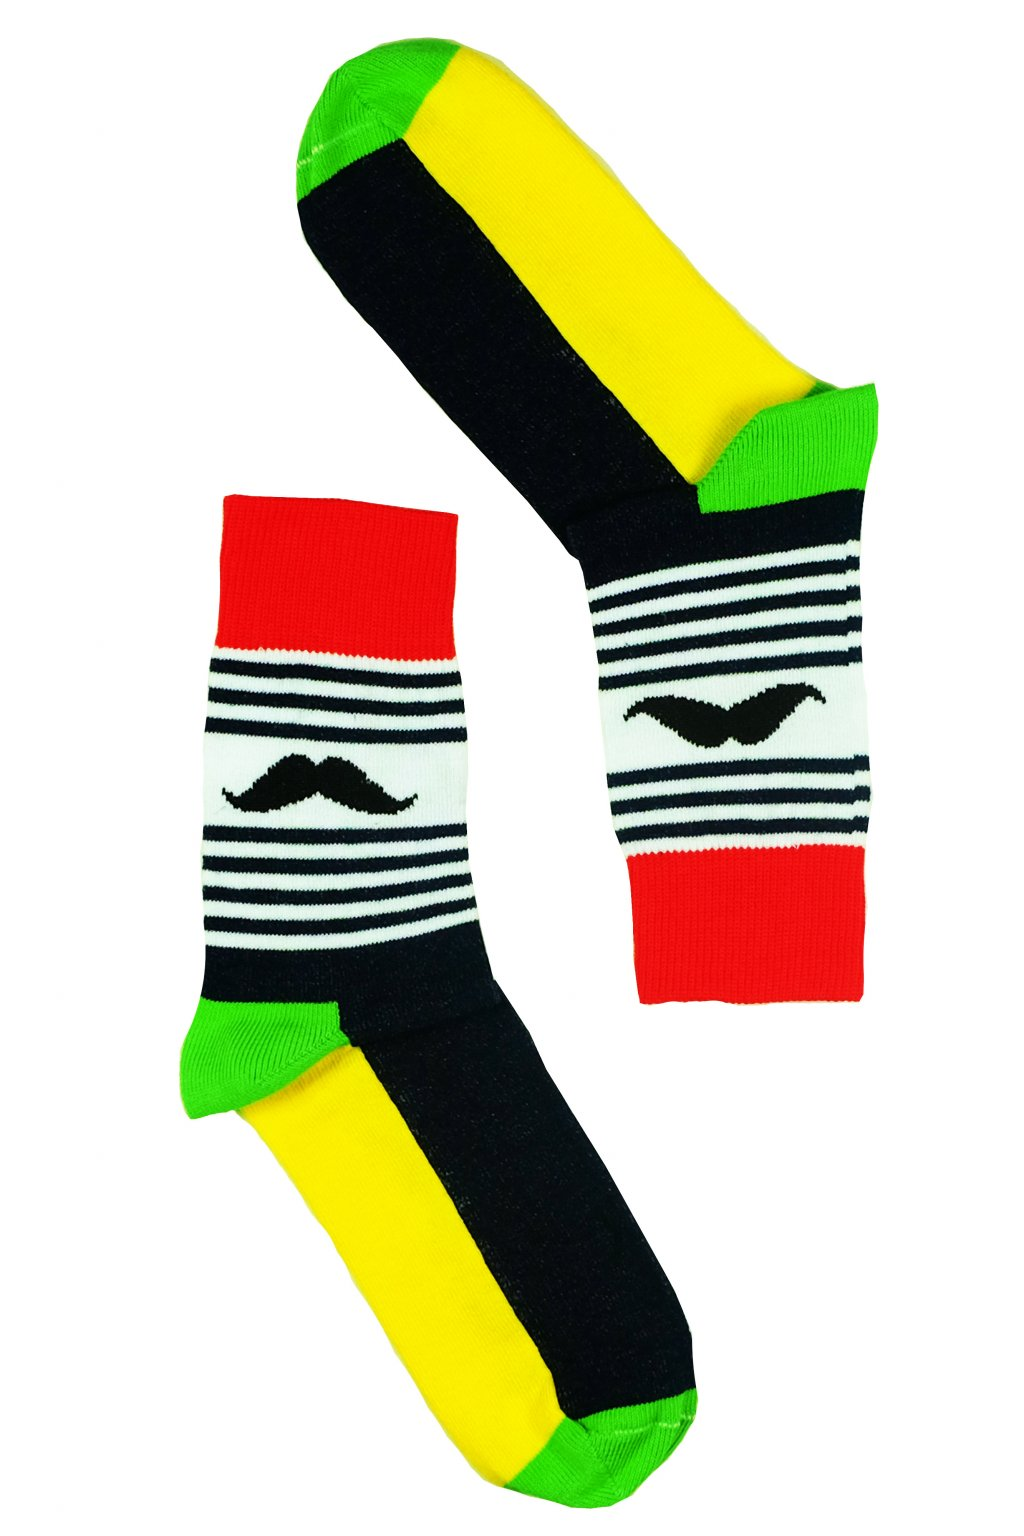 zlutozelene barevne vesele ponozky Le Fusek